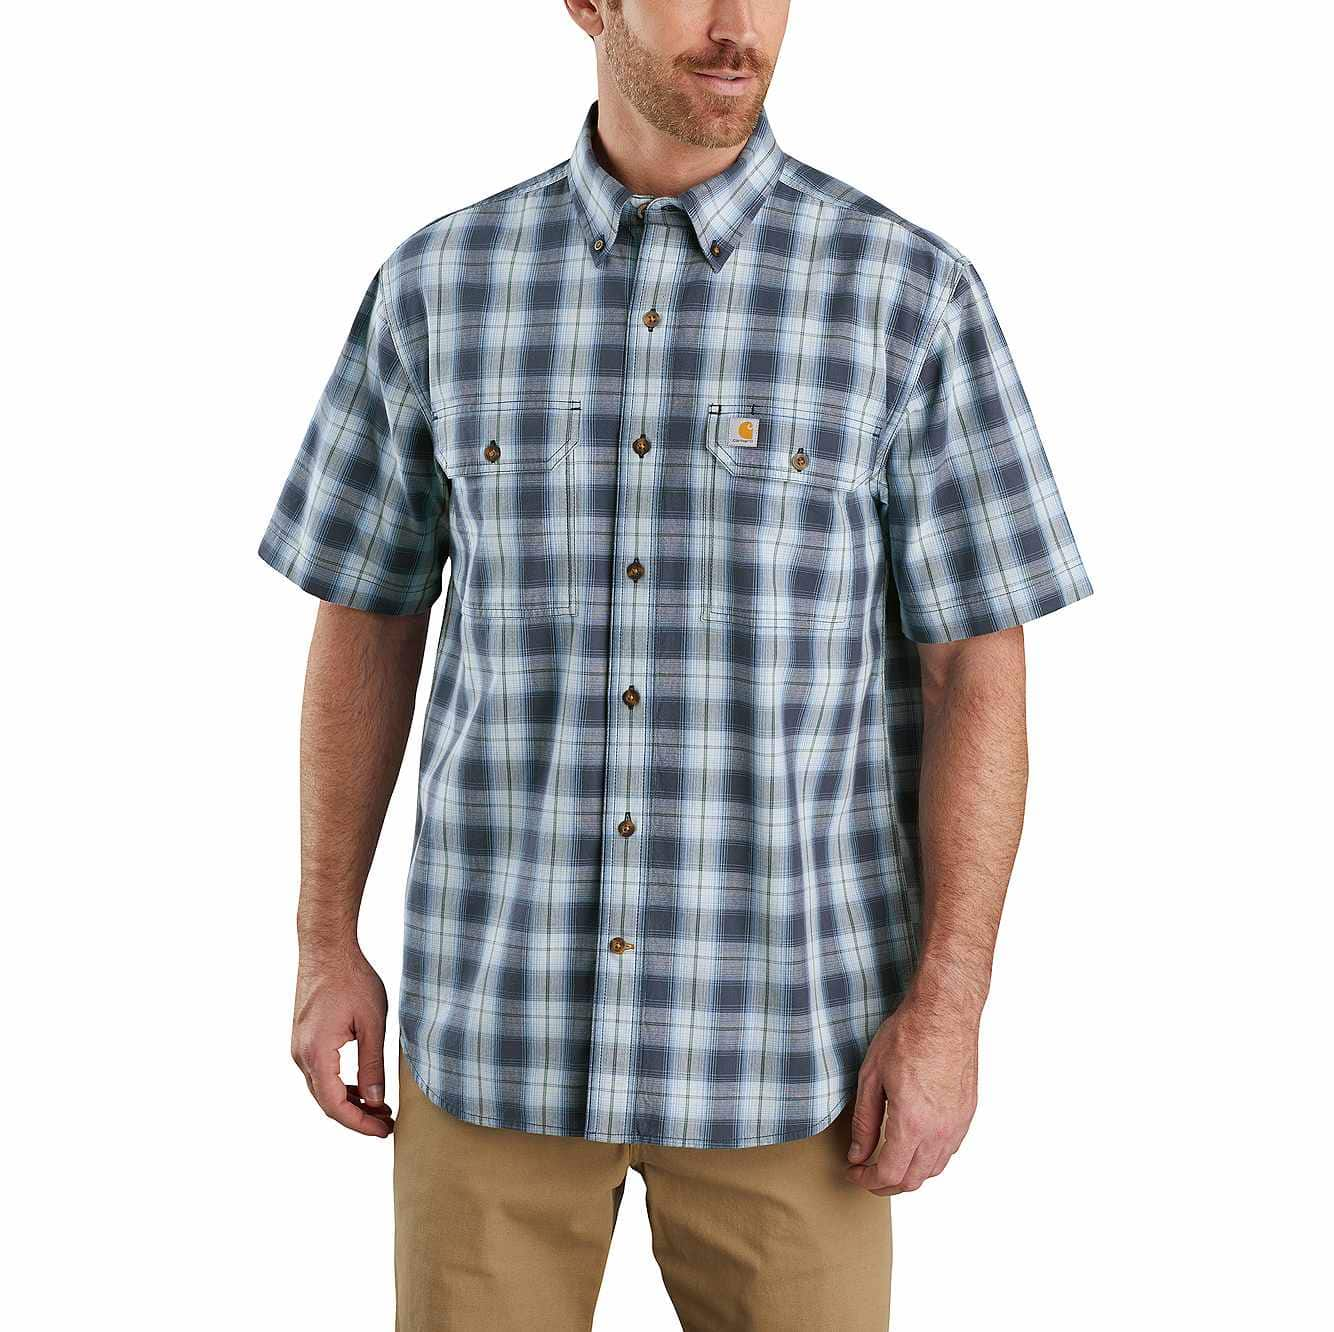 Original Fit Midweight Short-Sleeve Button-Front Plaid Shirt